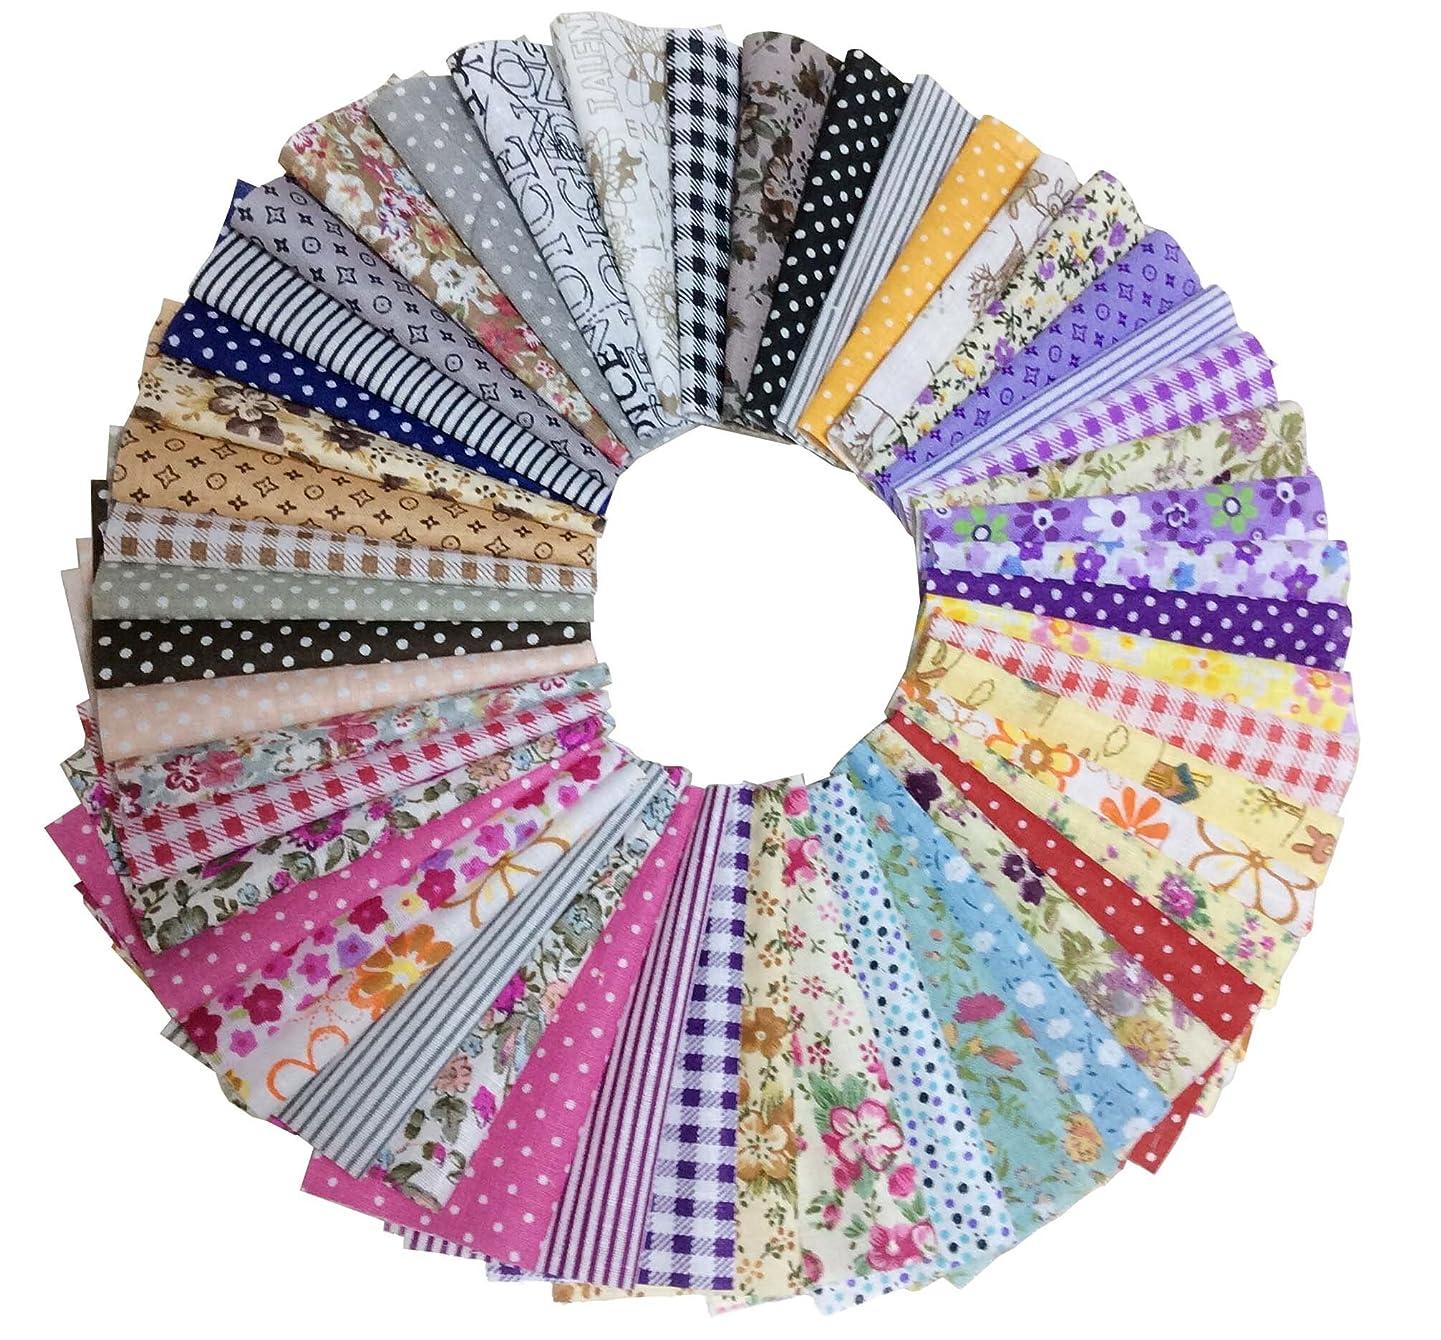 longshine-us Premium Cotton Craft Fabric Bundle Squares Patchwork Lint DIY Sewing Scrapbooking Quilting Dot Pattern Artcraft (50pcs 4